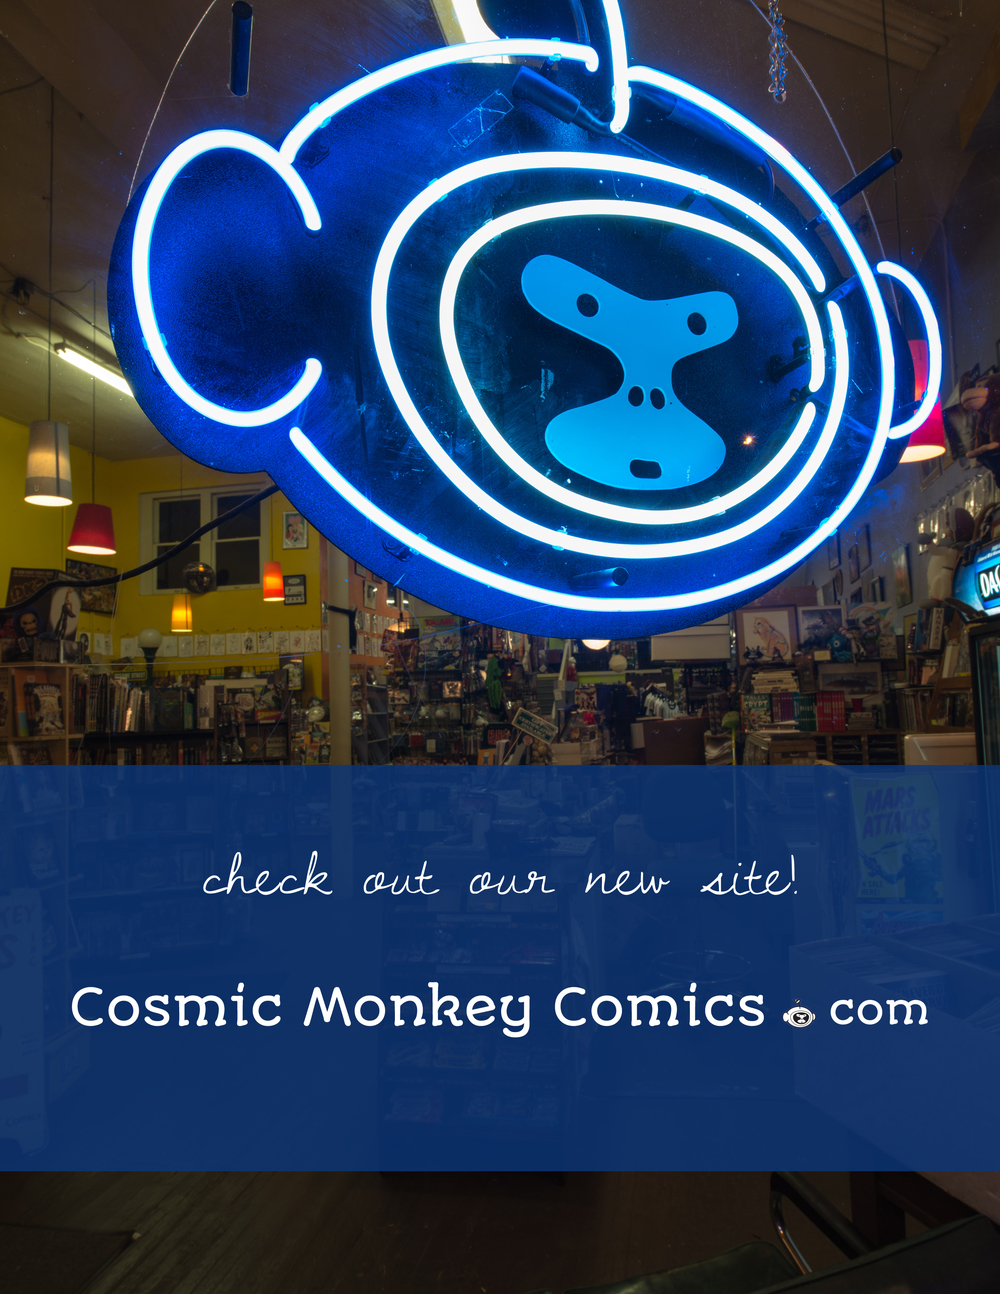 www.cosmicmonkeycomics.com 56th and Sandy, Portland OR